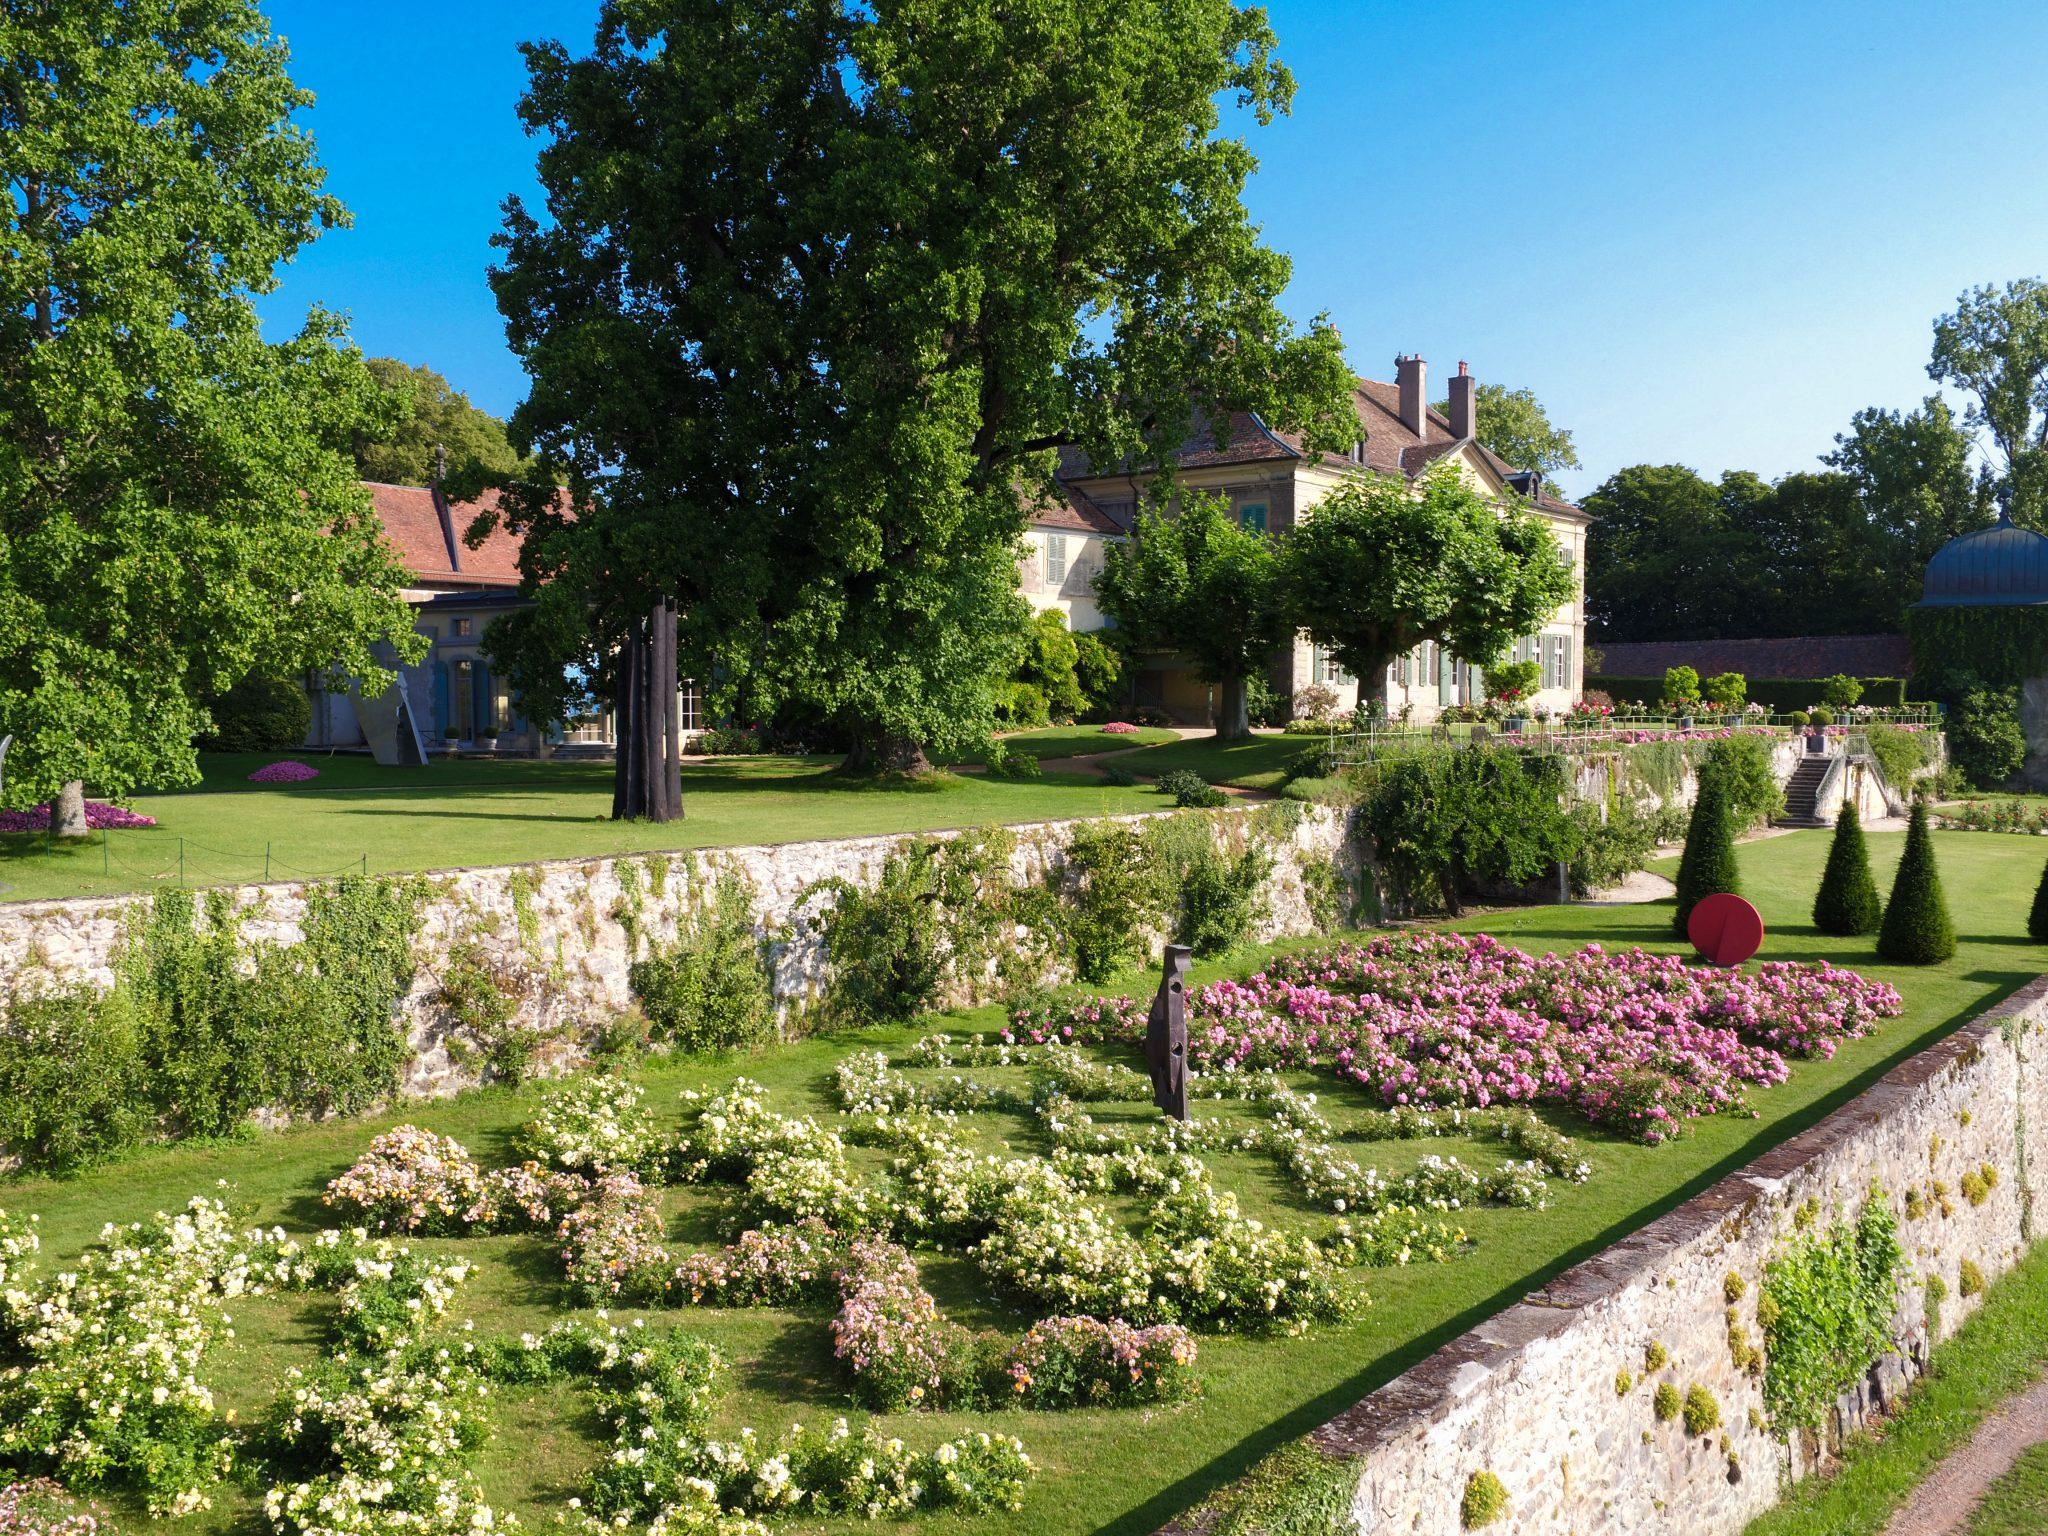 Vue aérienne du jardin de Dorianne.